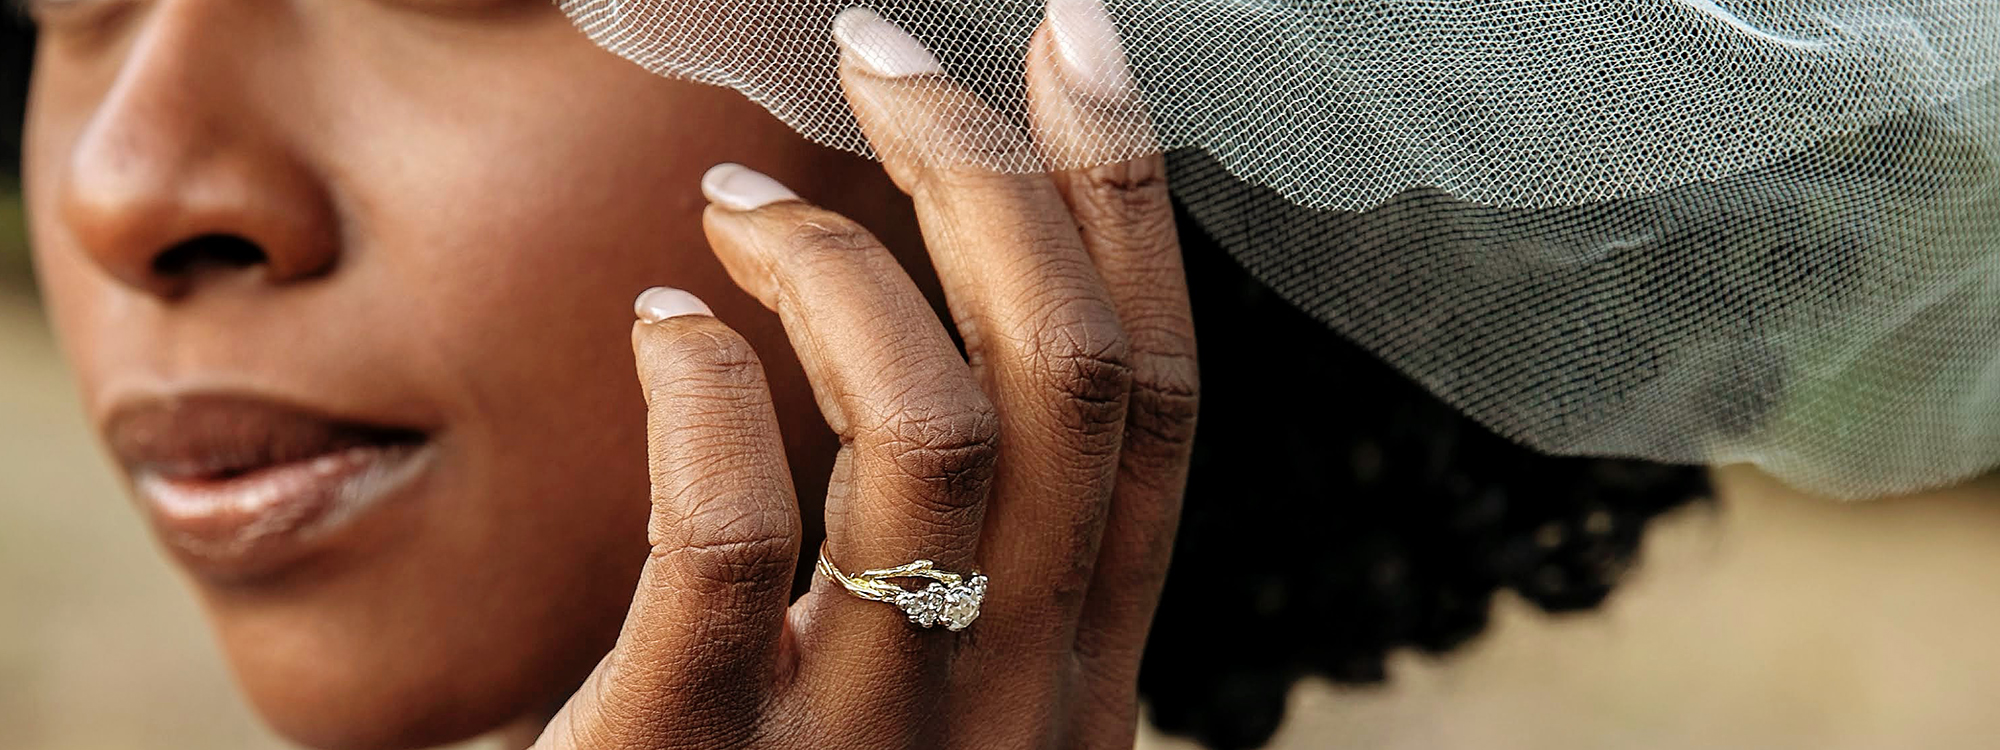 nature-engagement-rings-olivia-ewing-jewelry.jpg